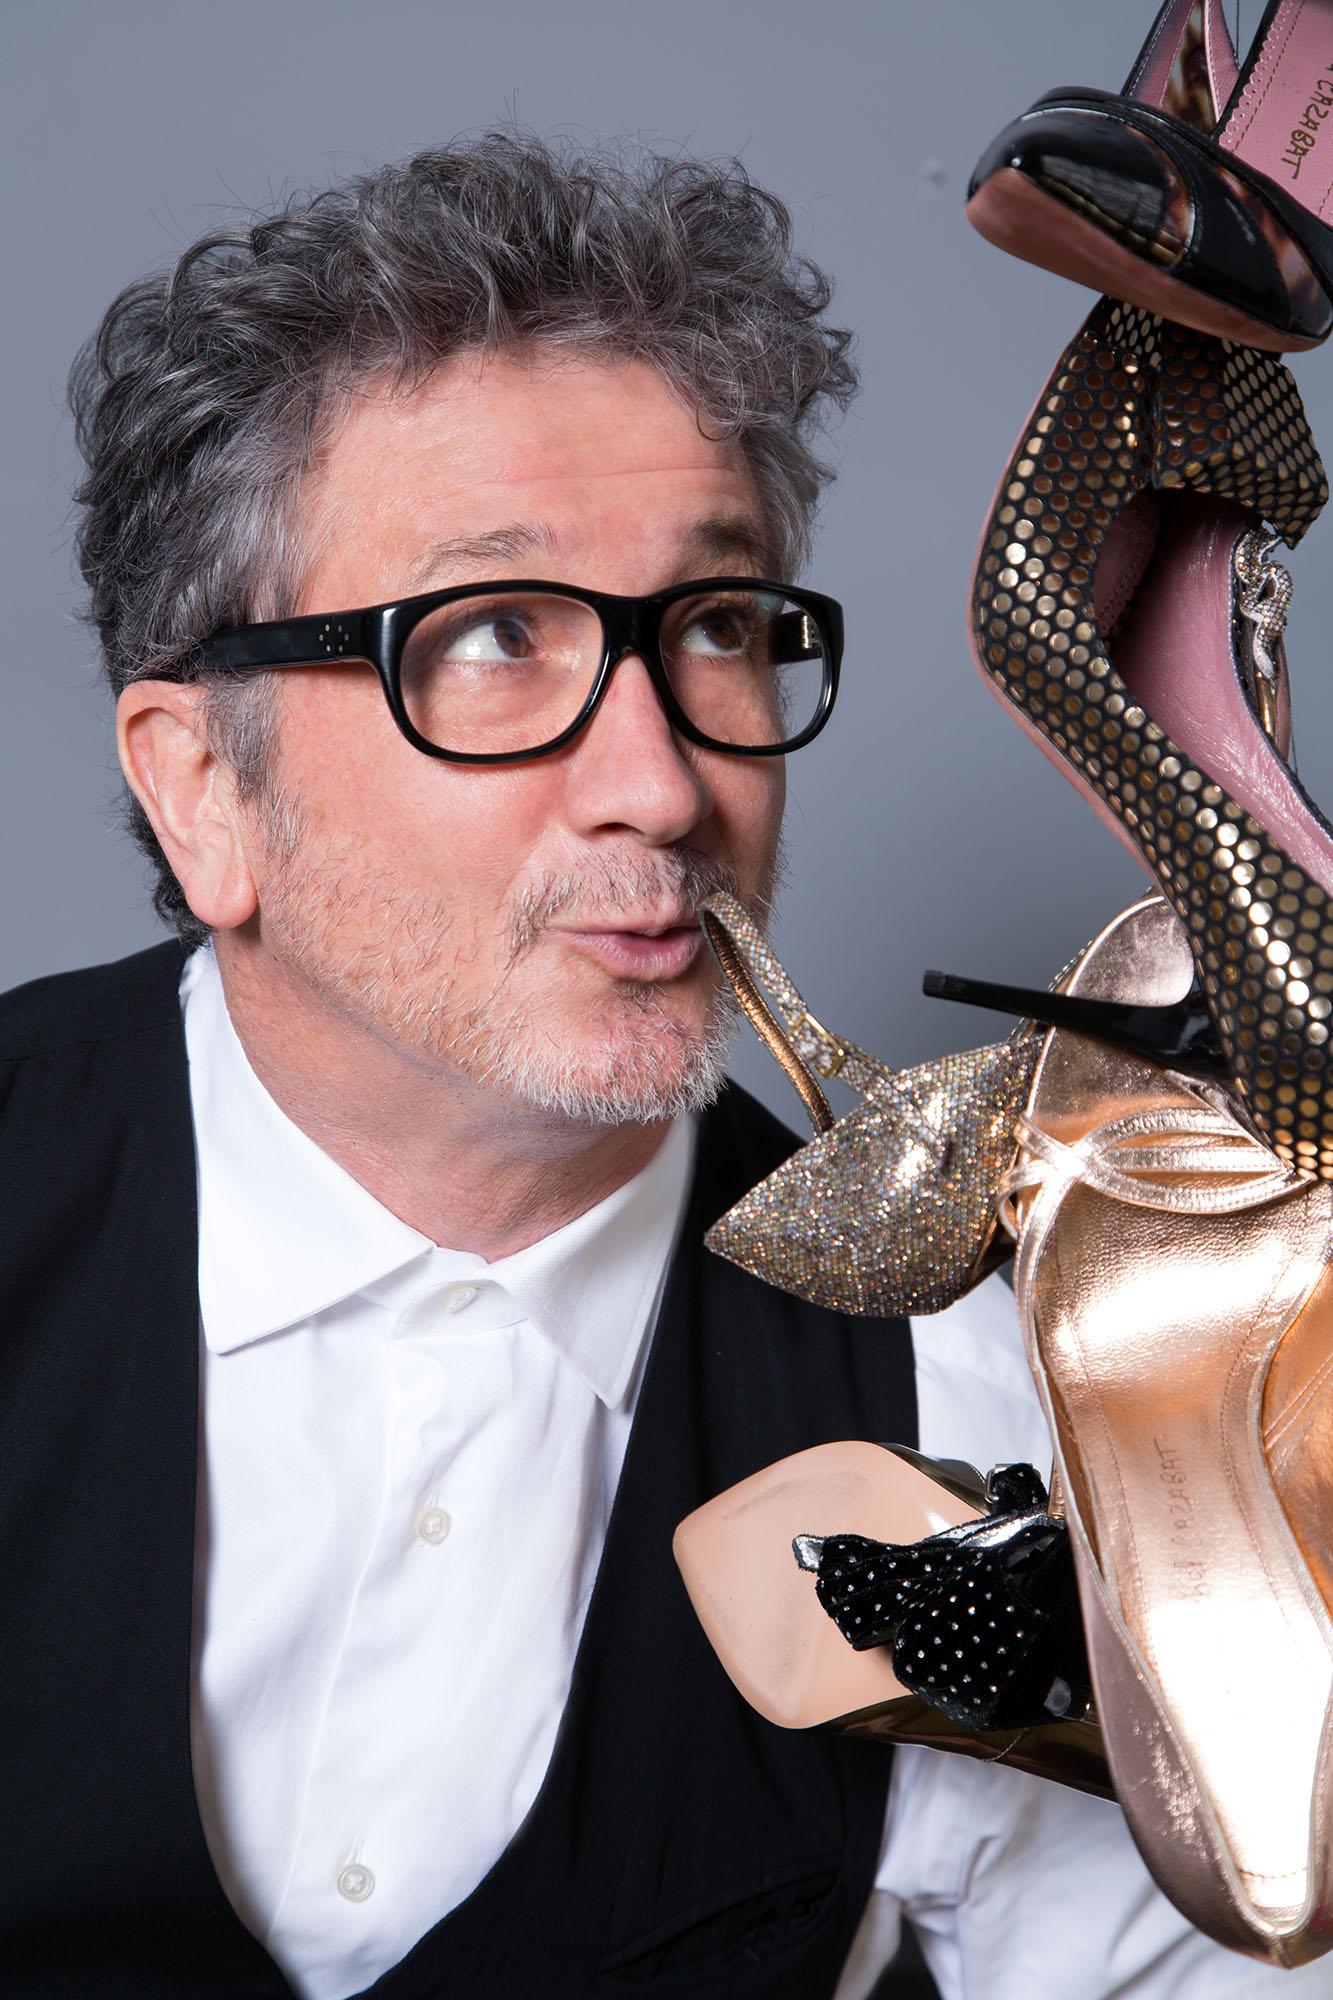 Luxury shoe designer Jean-Michel Cazabat